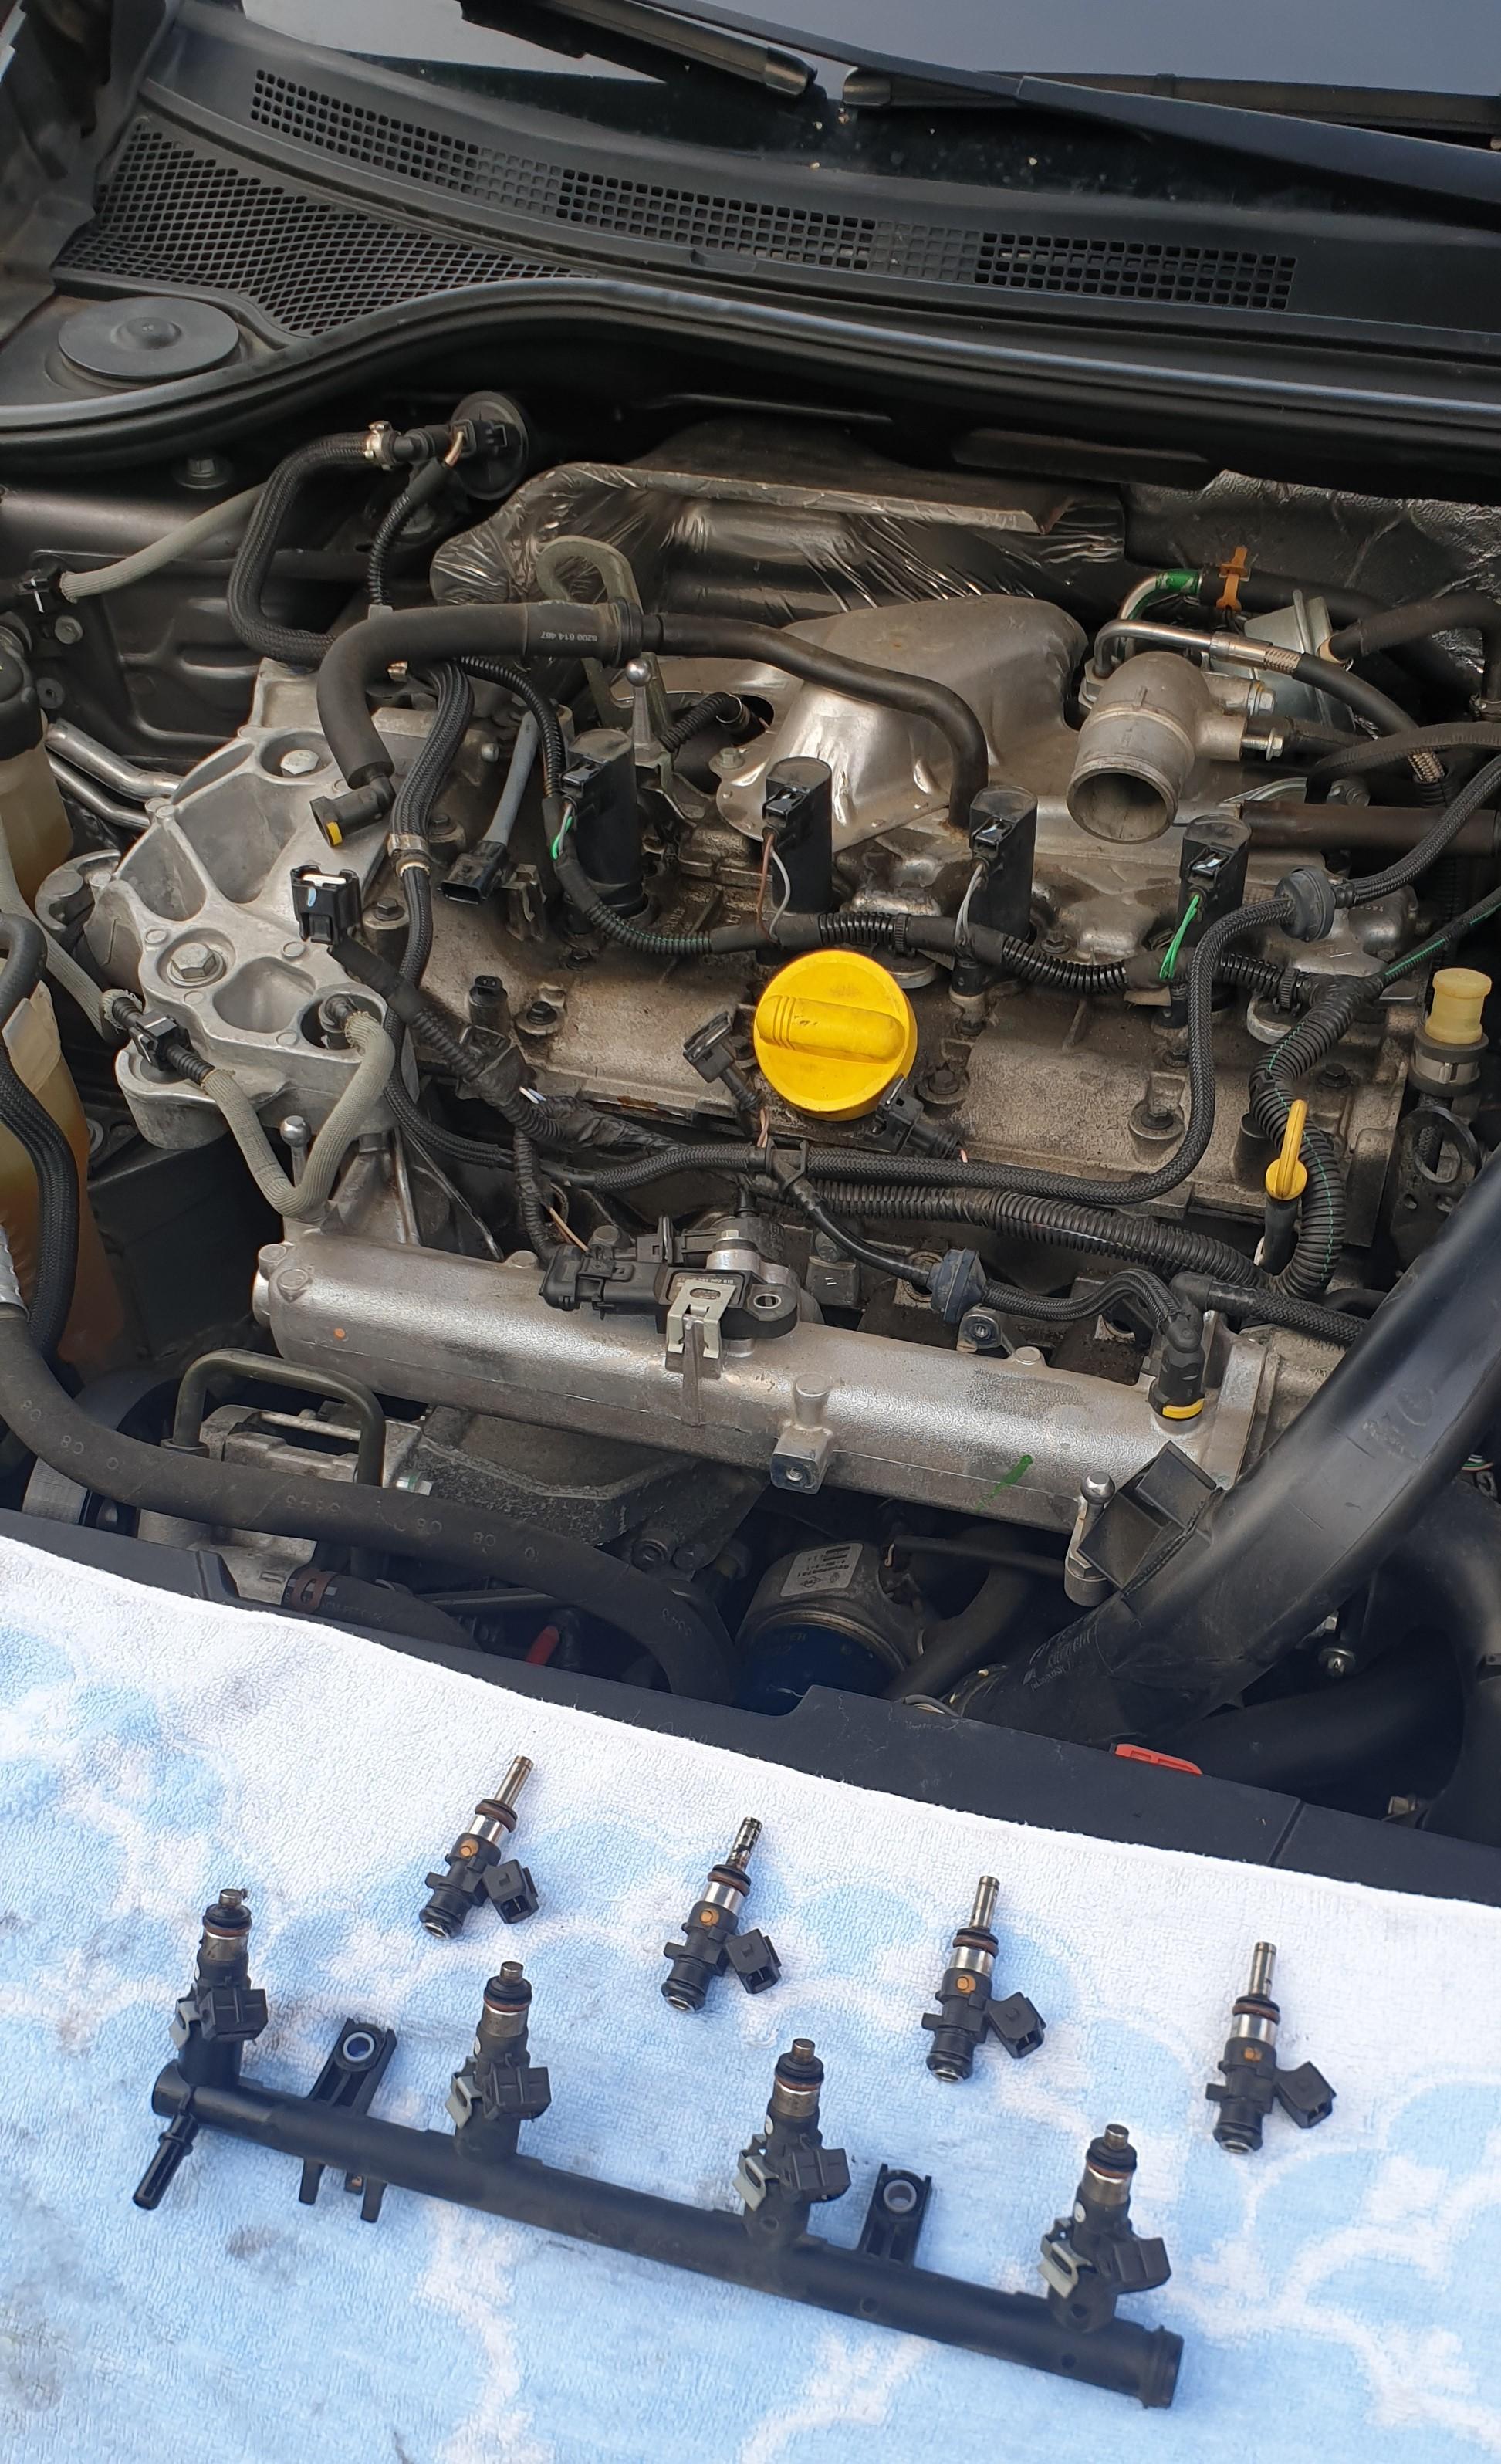 [gaetanXS] Laguna III.1 Coupé 2.0 Turbo GT 205 - Page 2 20020910371924098716639231